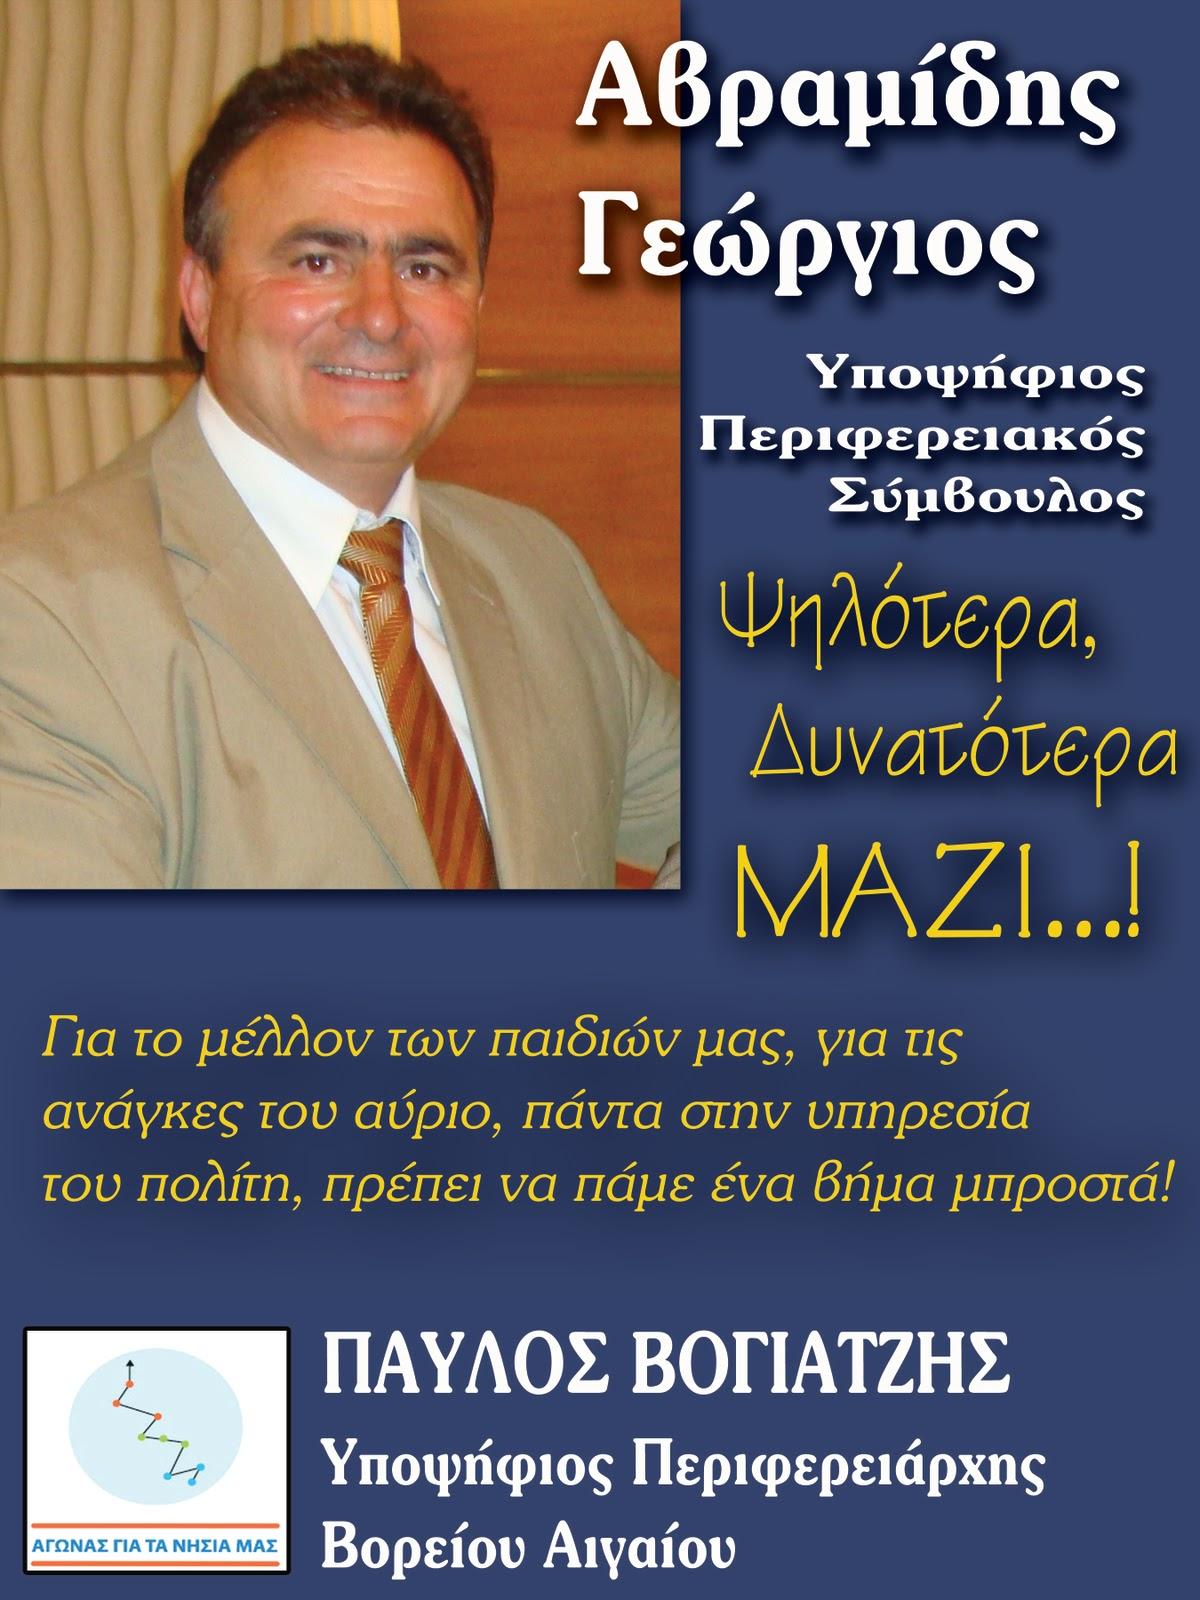 http://2.bp.blogspot.com/_XT_FBWXuJXs/TMPsDQzro7I/AAAAAAAAE44/gkiCoTpZBb8/s1600/%CE%91%CE%92%CE%A1%CE%91%CE%9C%CE%99%CE%94%CE%97%CE%A3.jpg